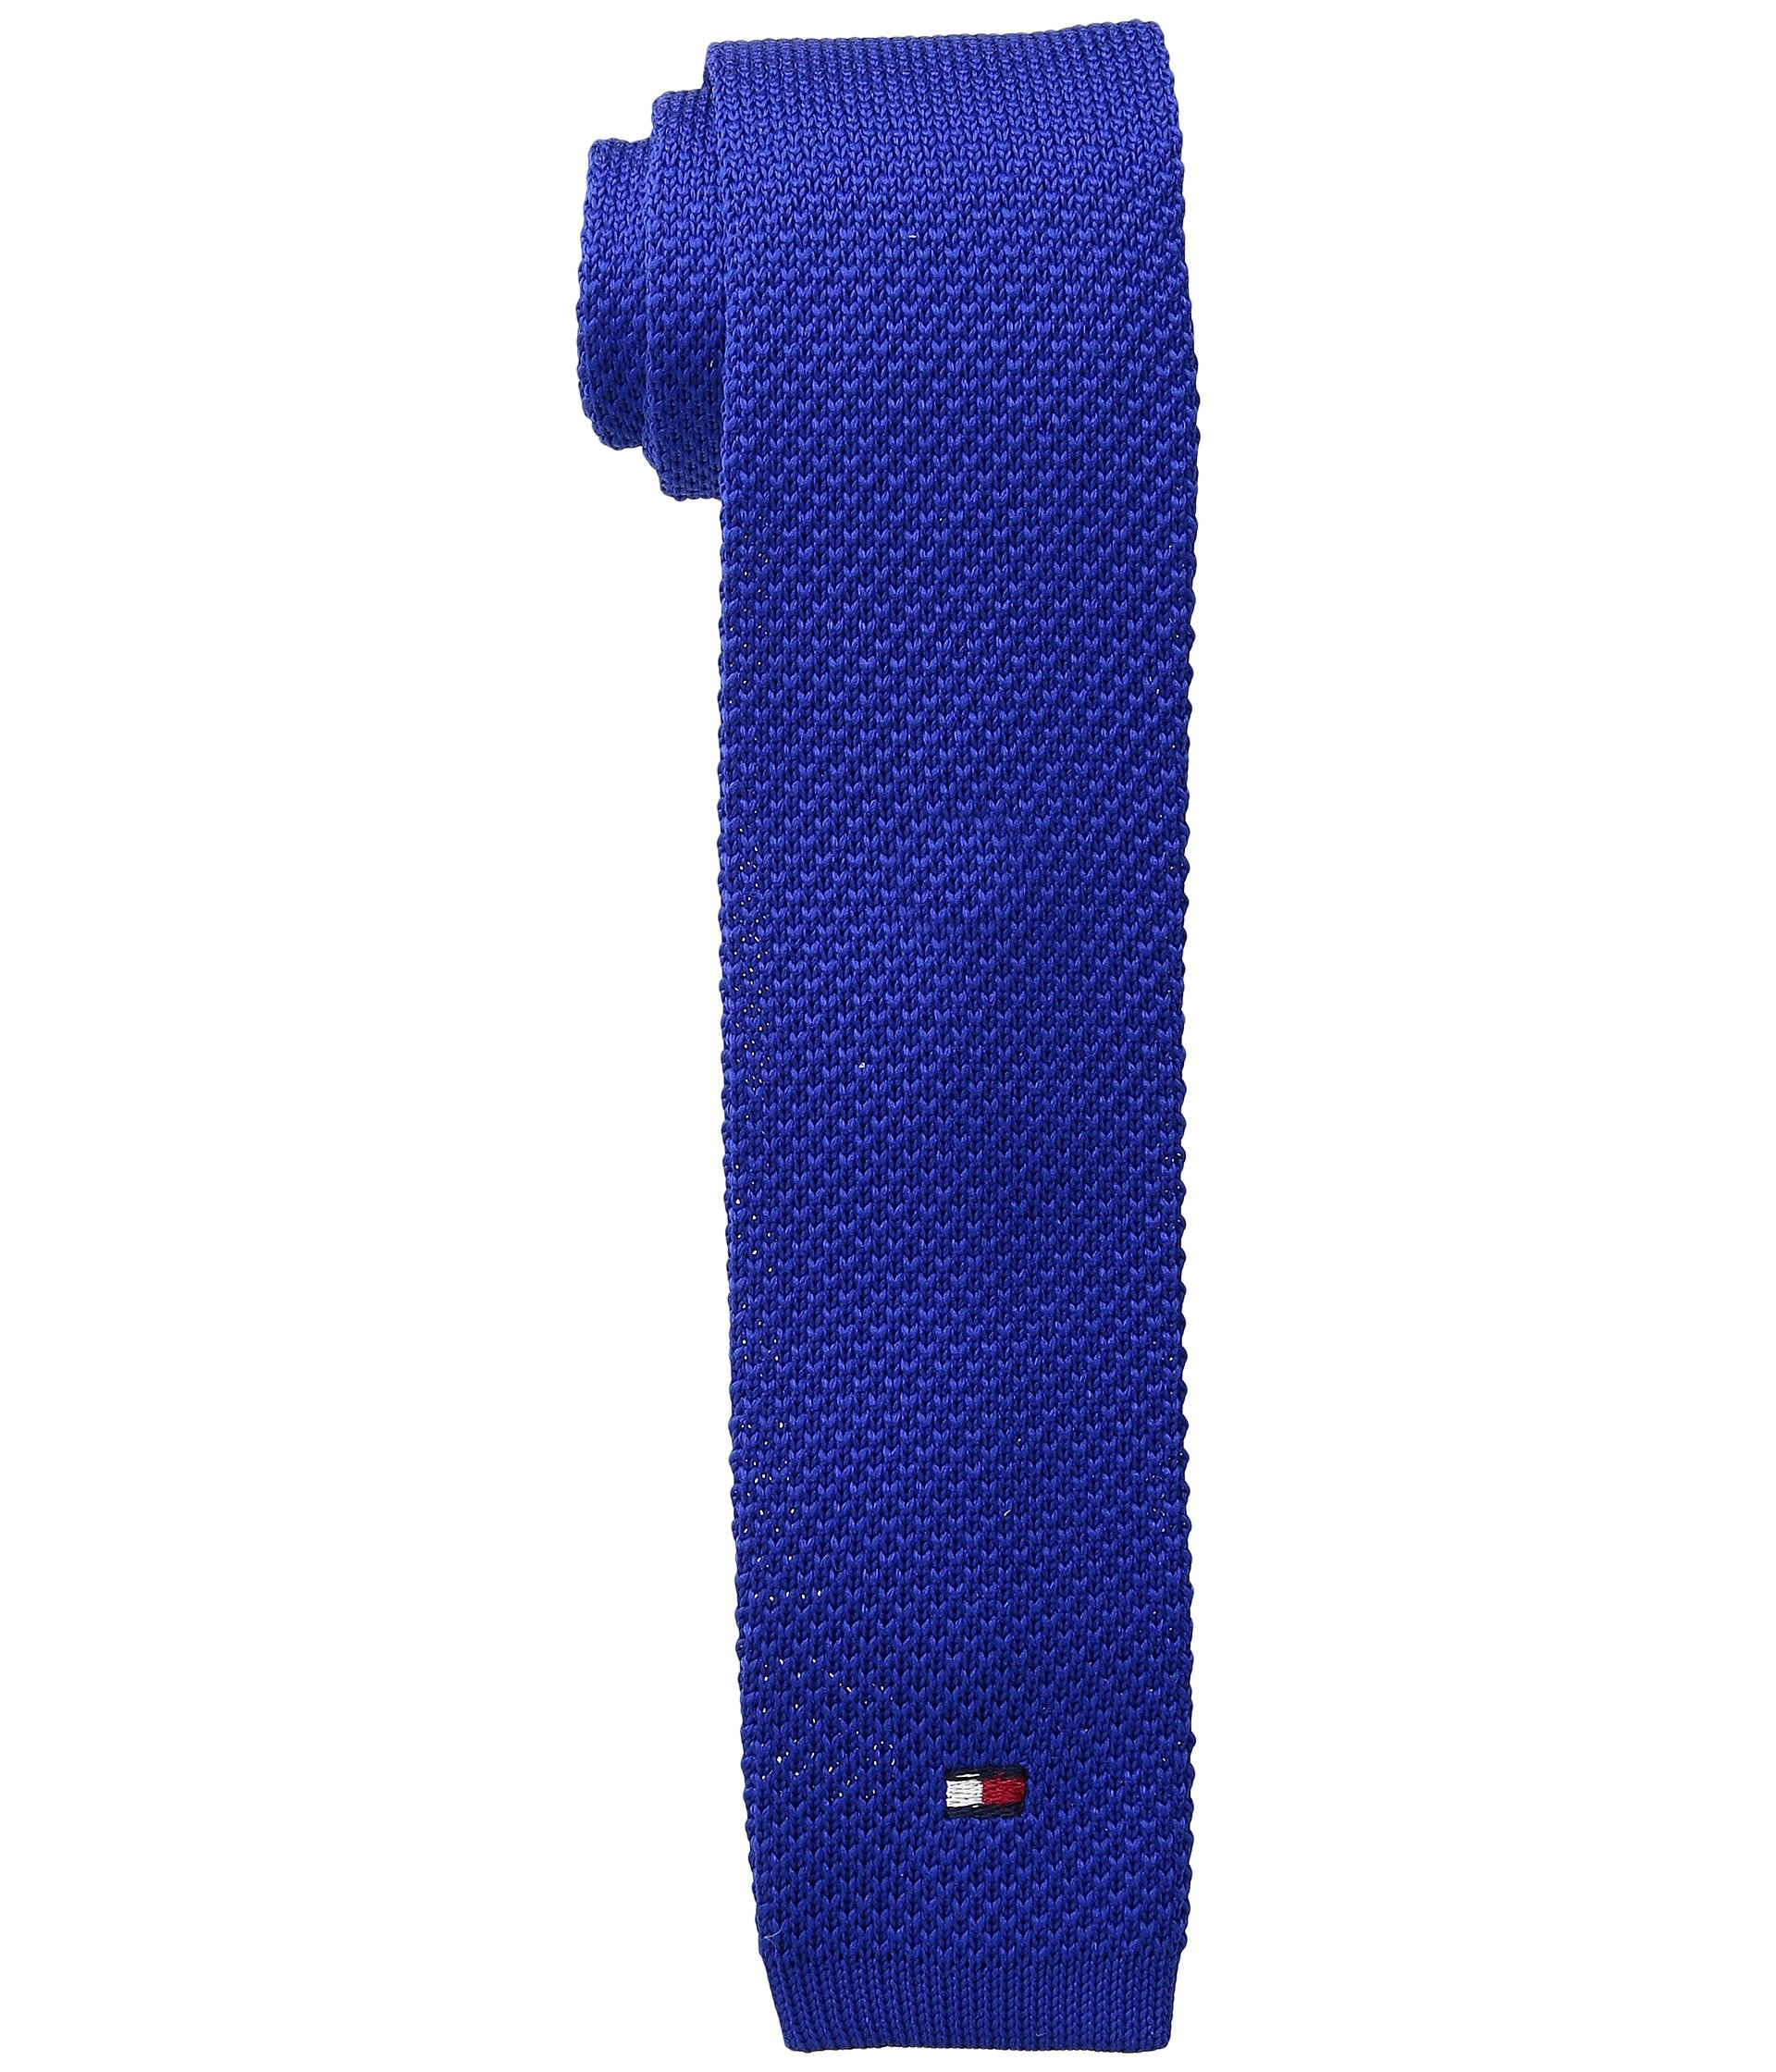 Corbata para Hombre Tommy Hilfiger Flag Logo  + Tommy Hilfiger en VeoyCompro.net